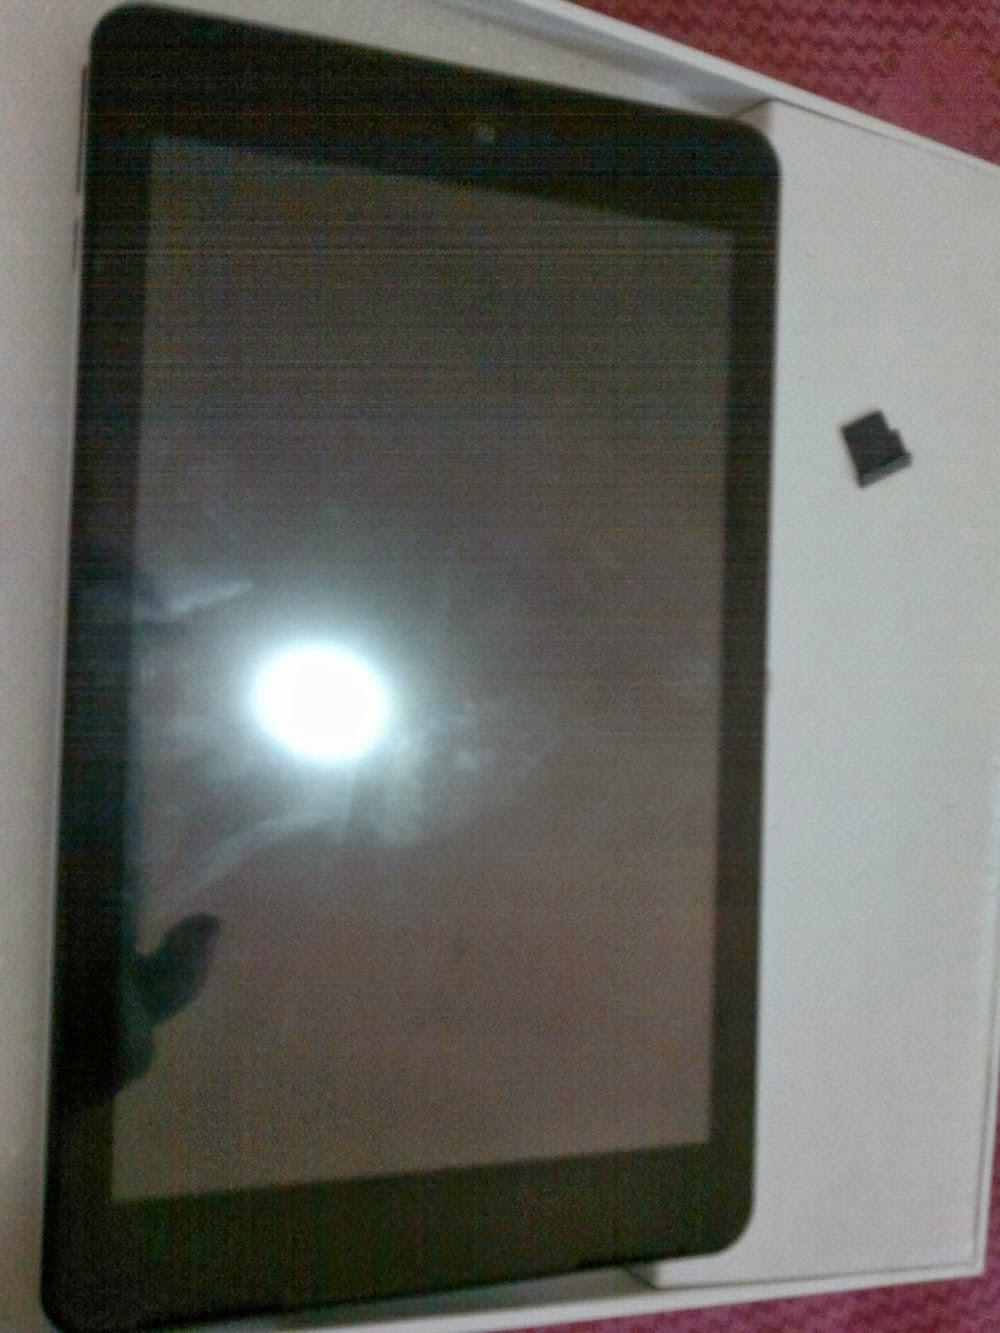 PLDT, Fab TAB Quadro 7, tablet, tab, android Jelly Bean